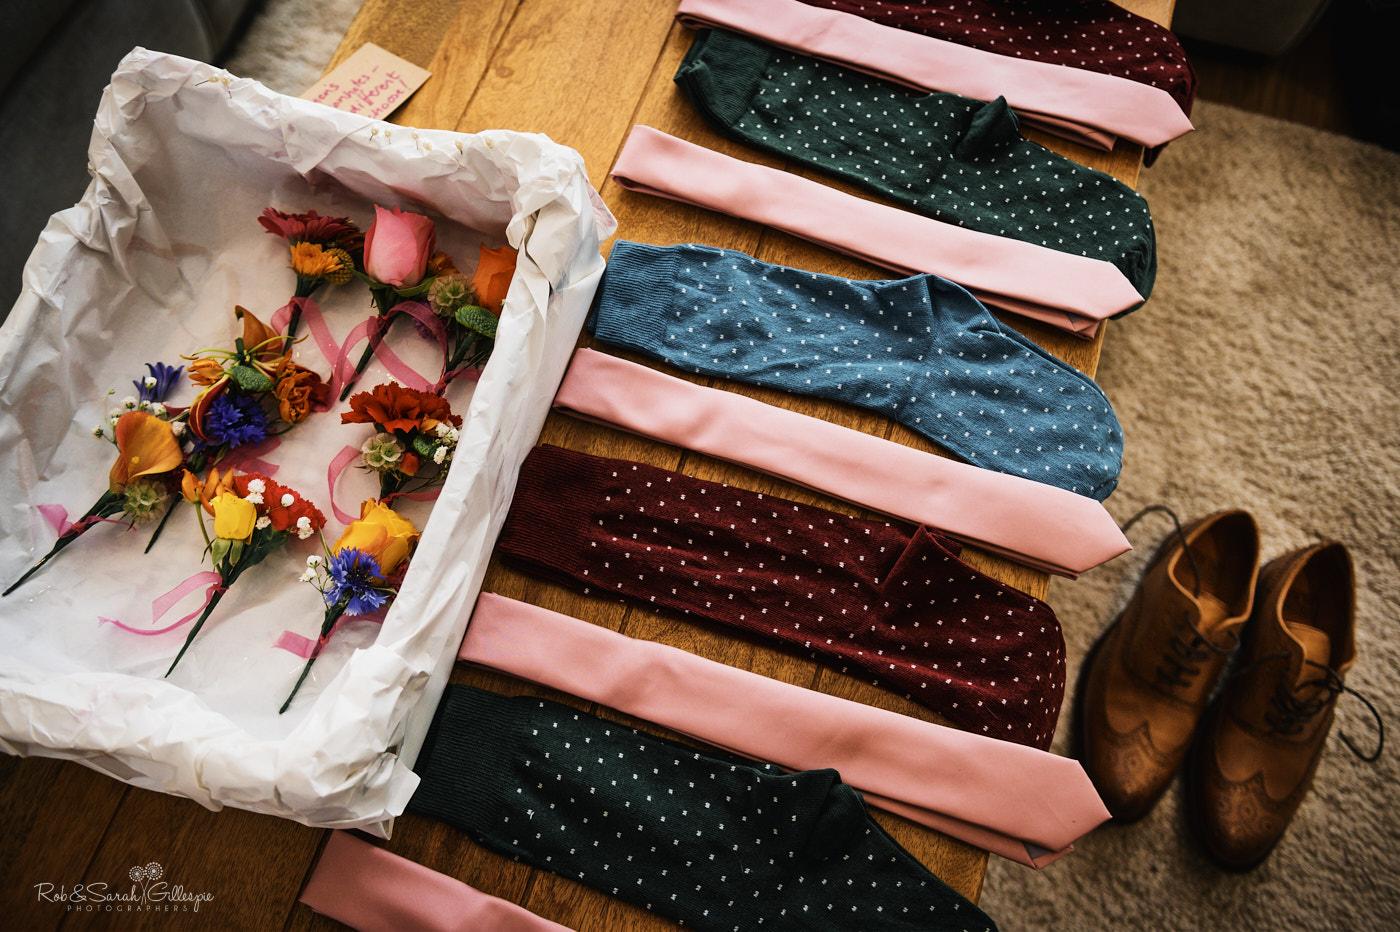 Groomsmens socks, shoes and flowers